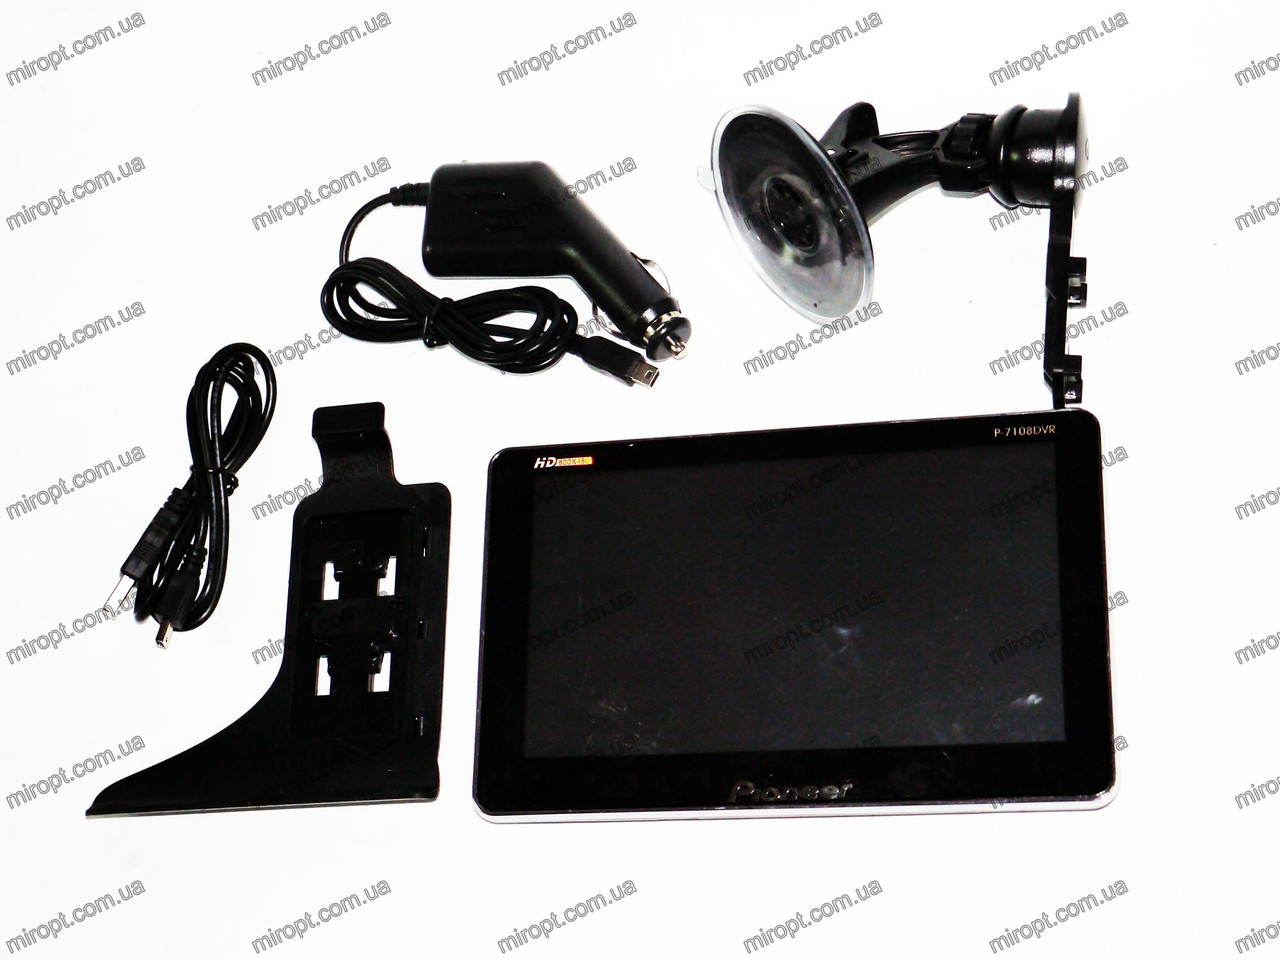 GPS навигатор Pioneer G7108 DVR+видеорегистратор + Bluetooth + 4gb